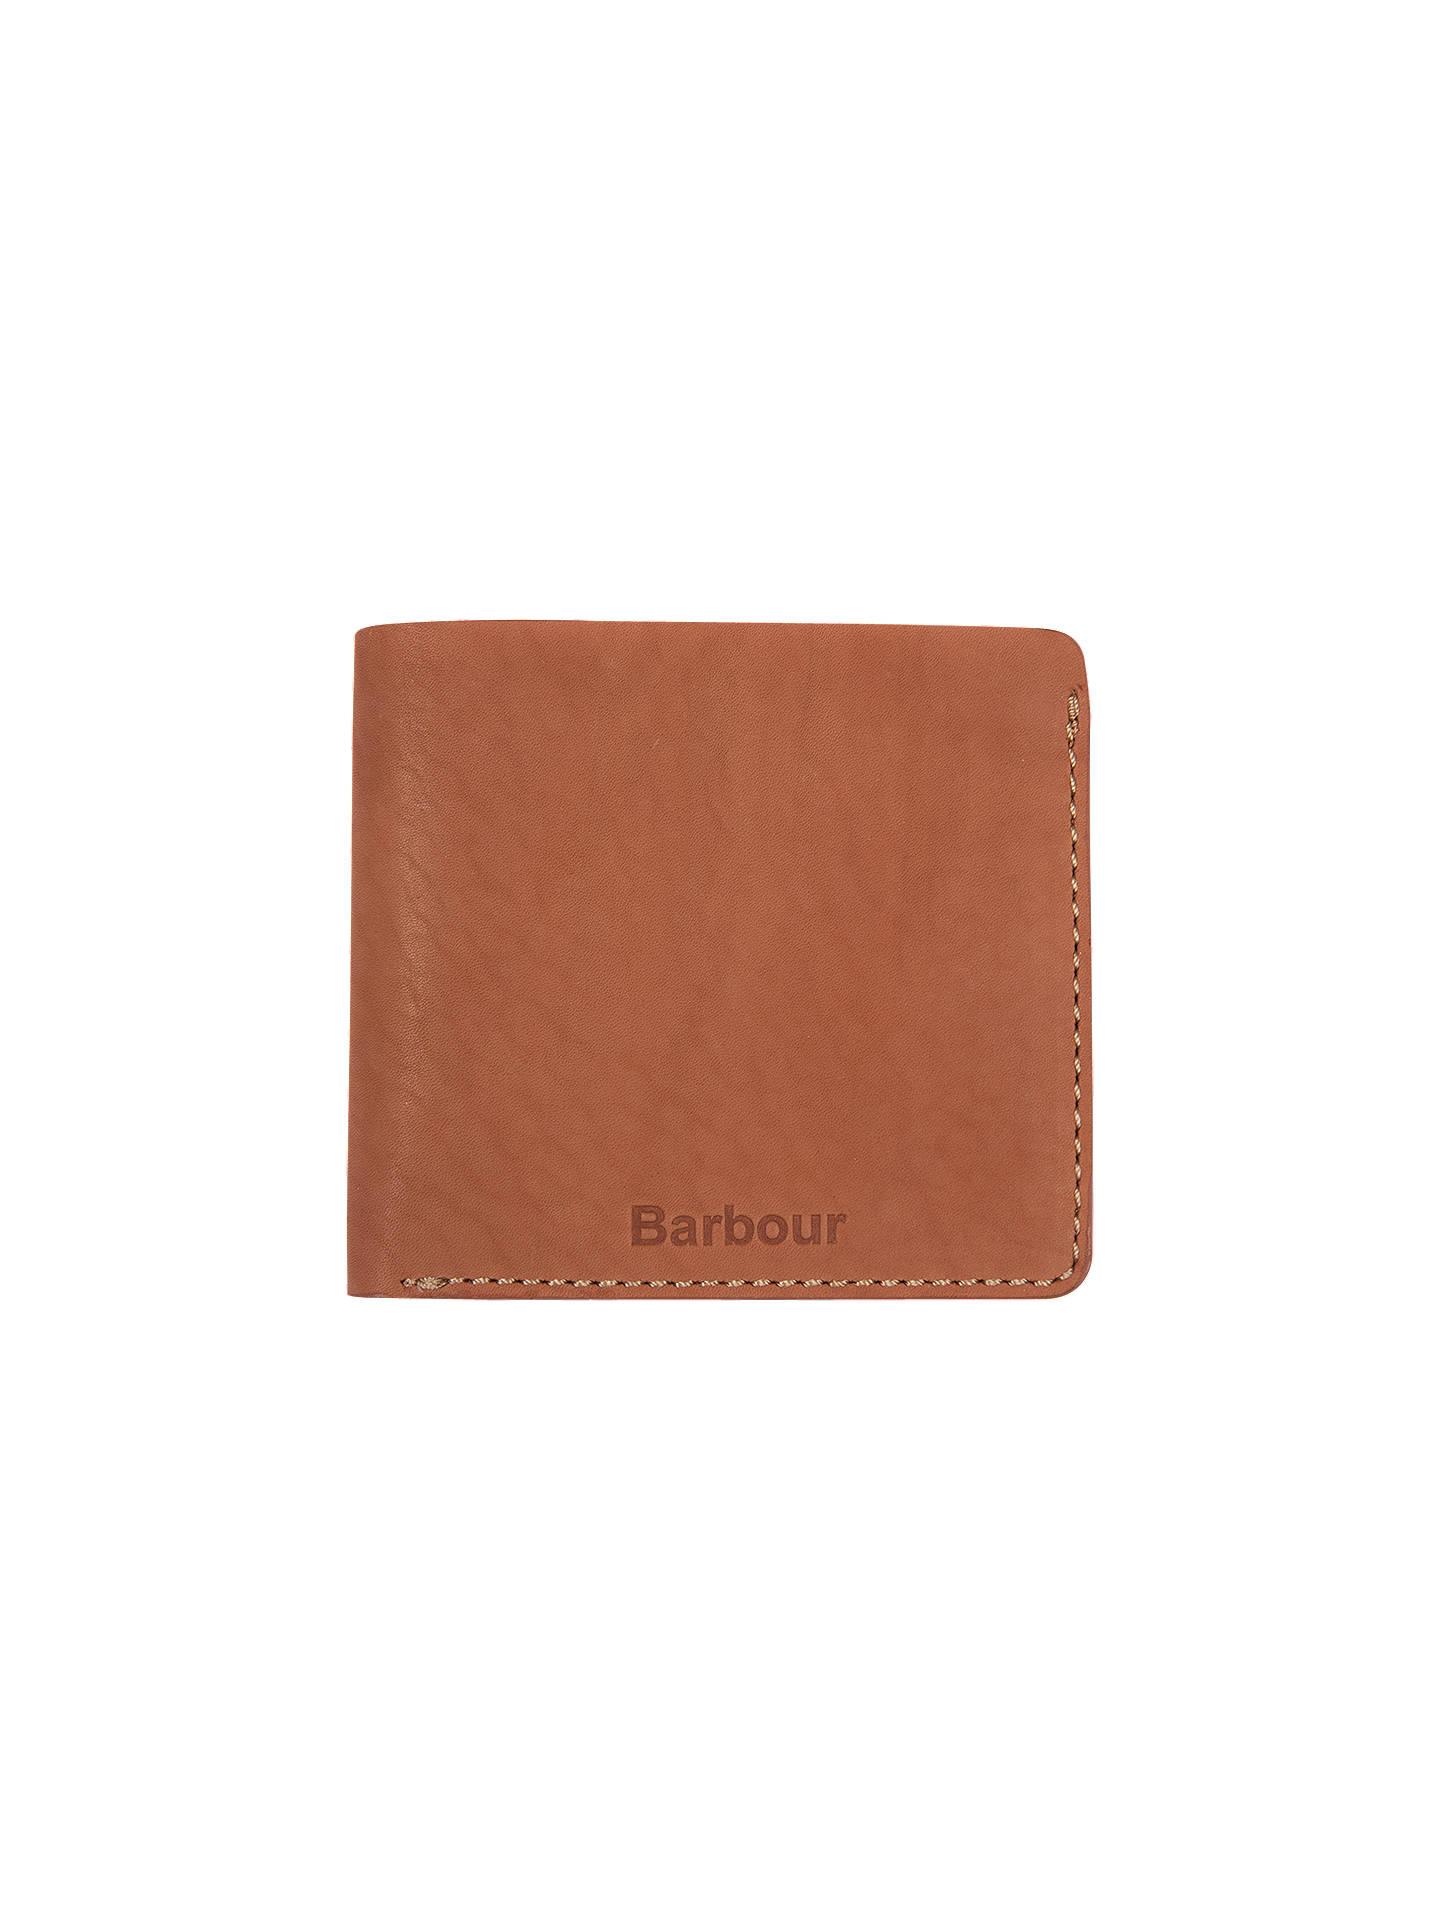 Barbour Leather Artisan Wallet, Tan, Tan